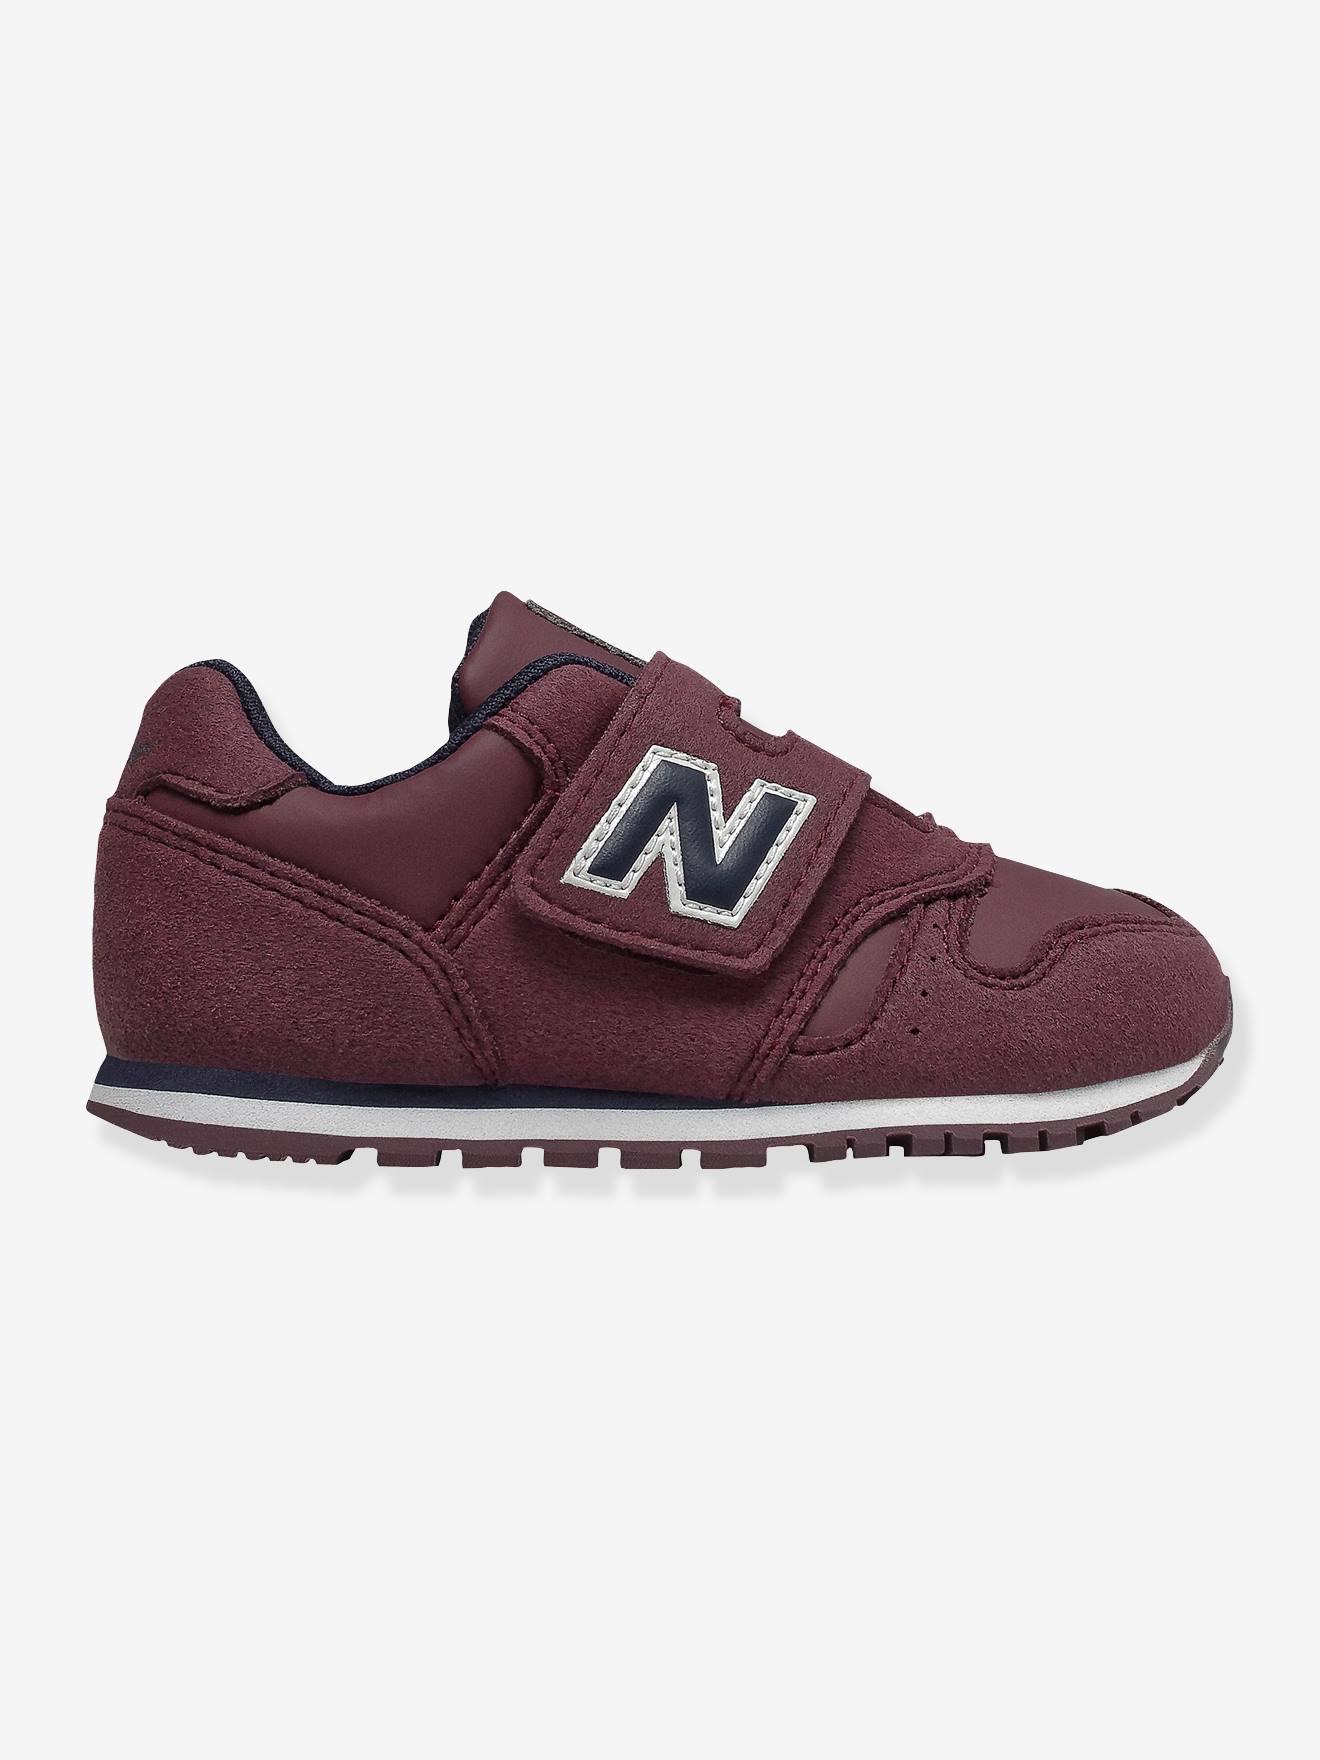 New Balance Baby Jungen Sneakers 373 NEW BALANCE, Klett in bordeaux